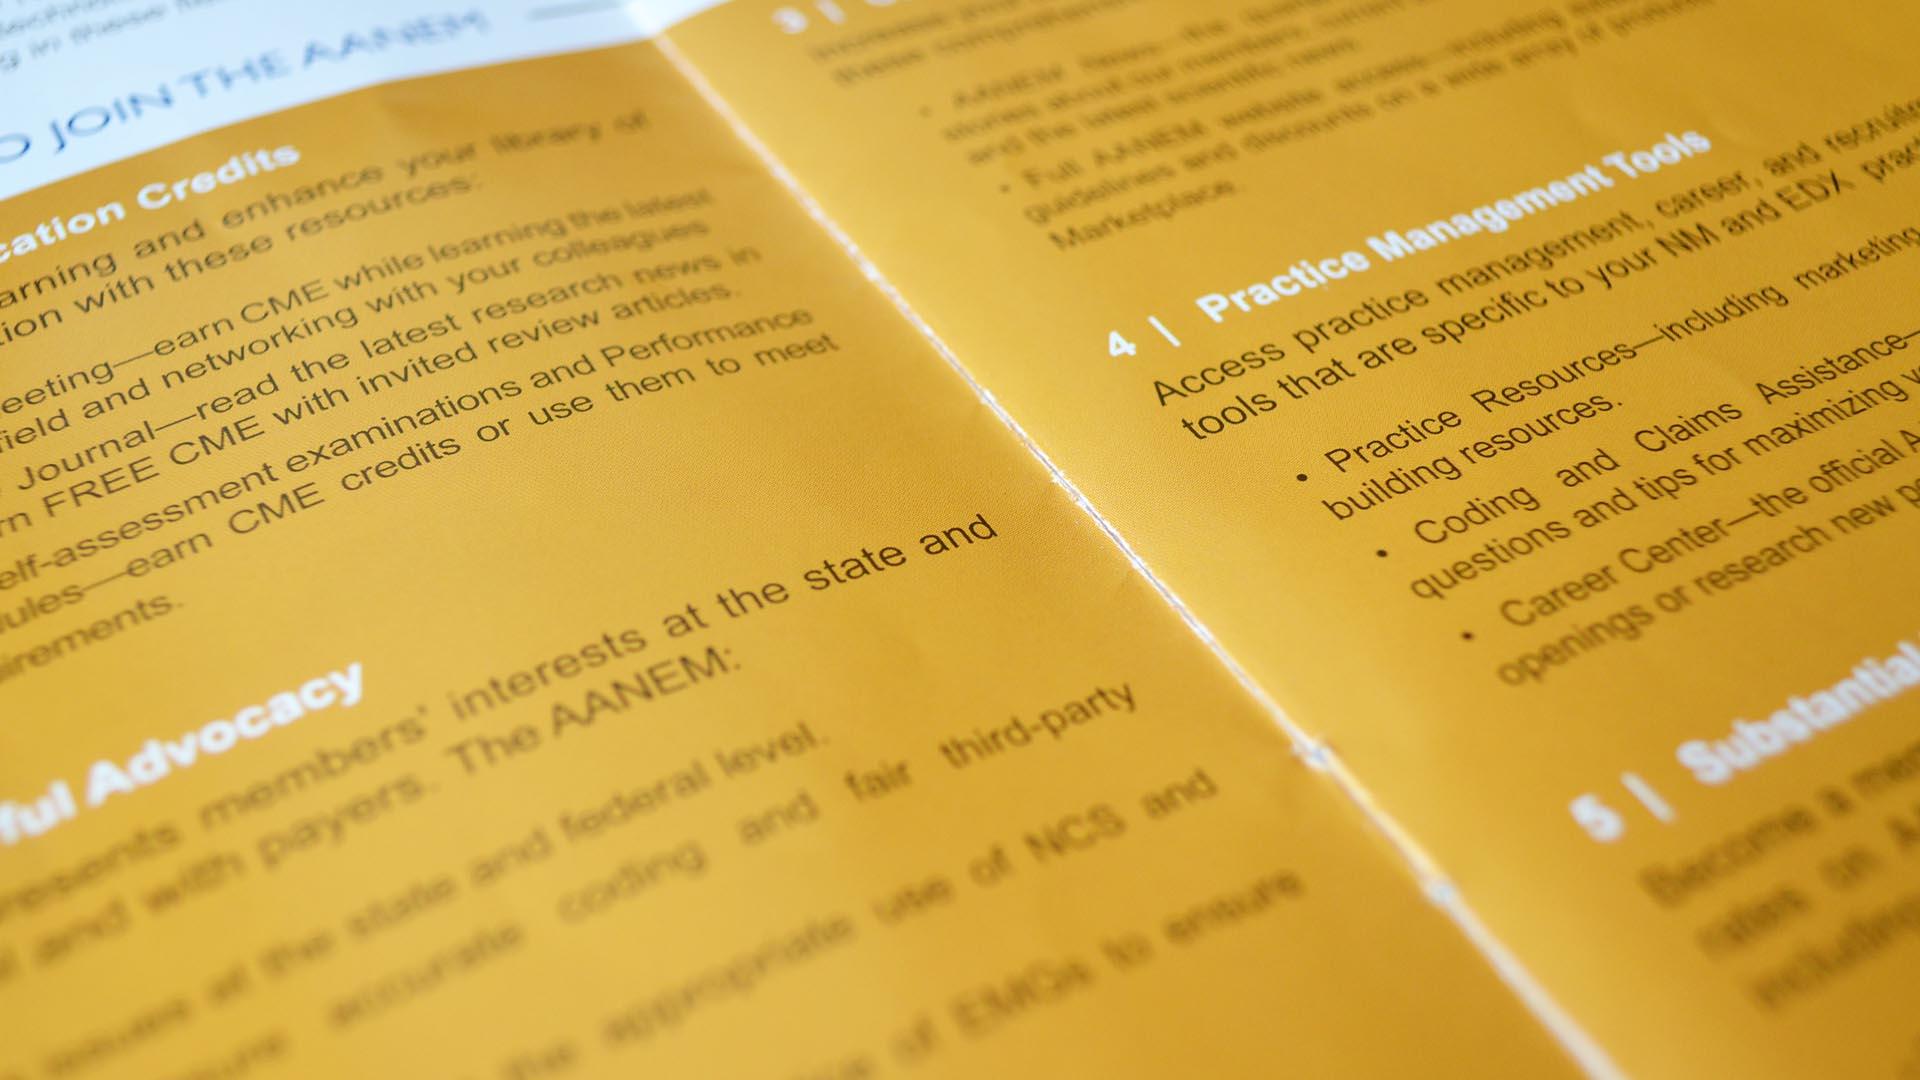 katie-kassel-hero-aanem-brochure-zoom